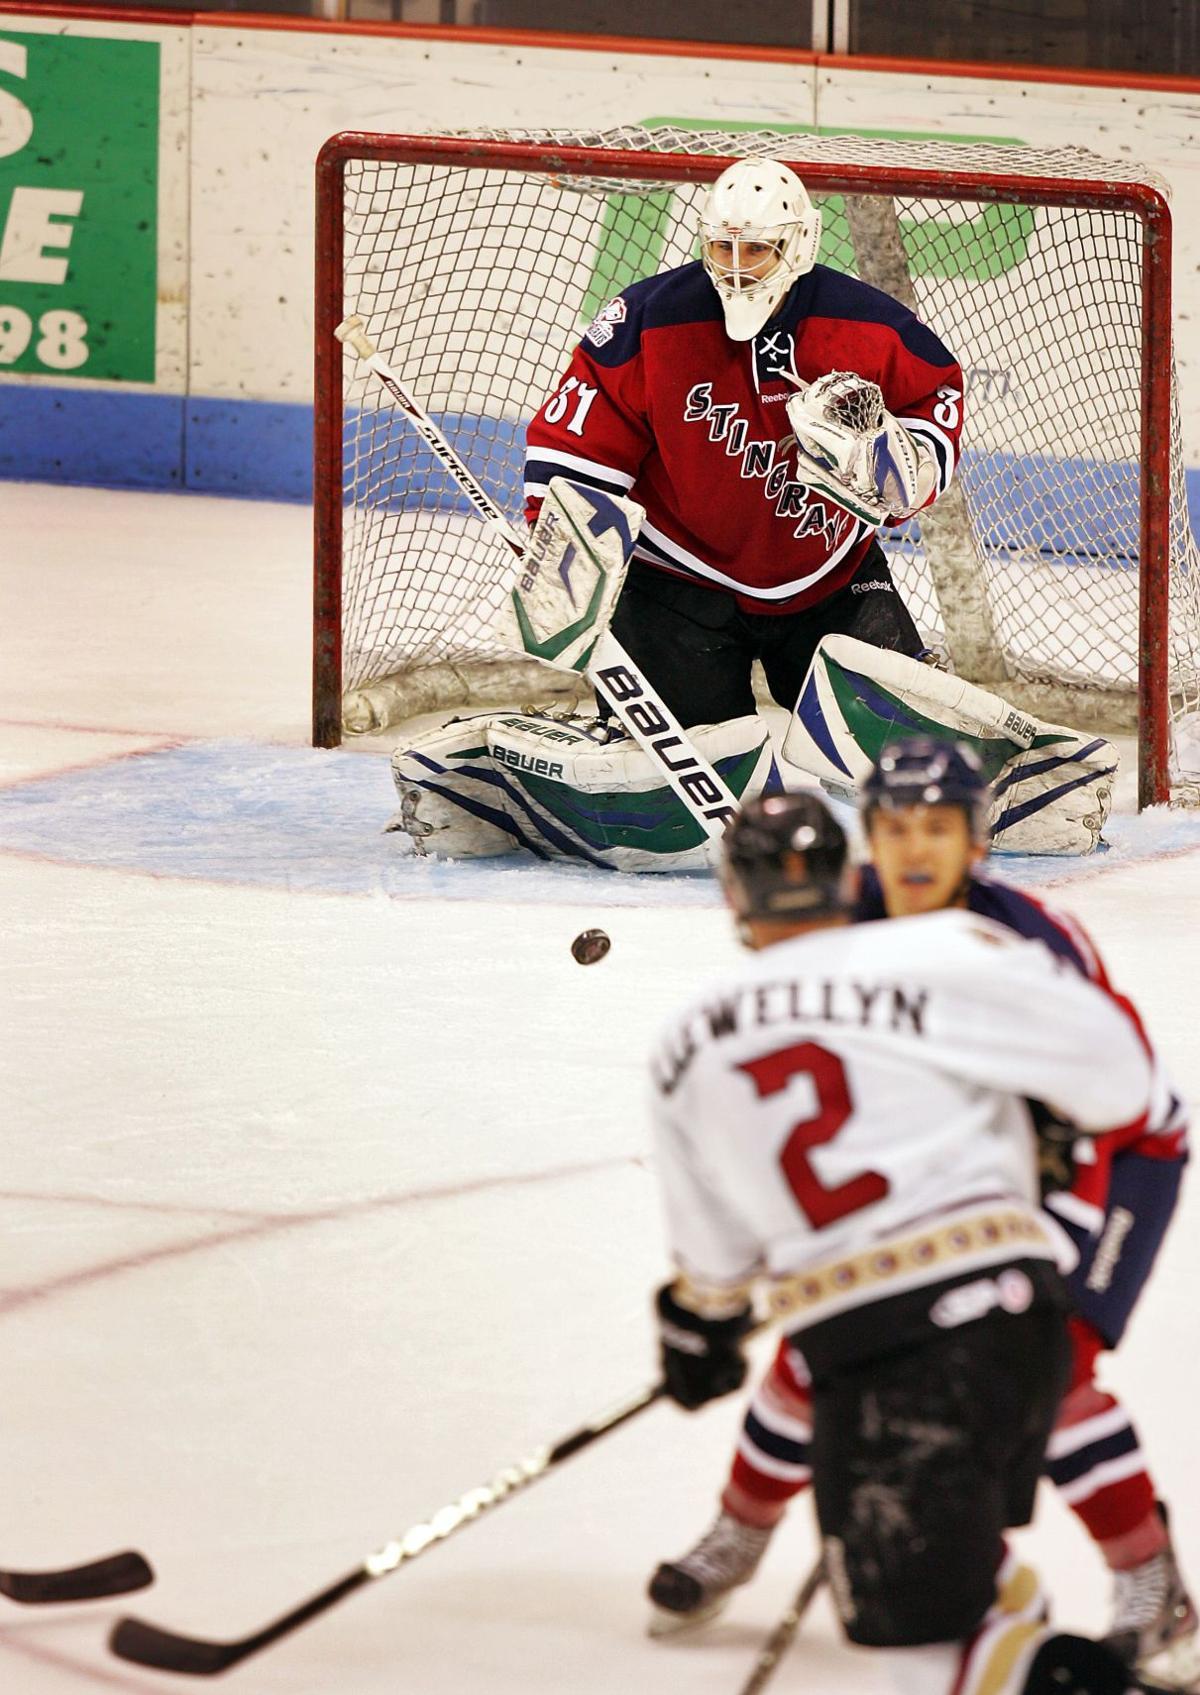 Zapolski named to ECHL All-Rookie team